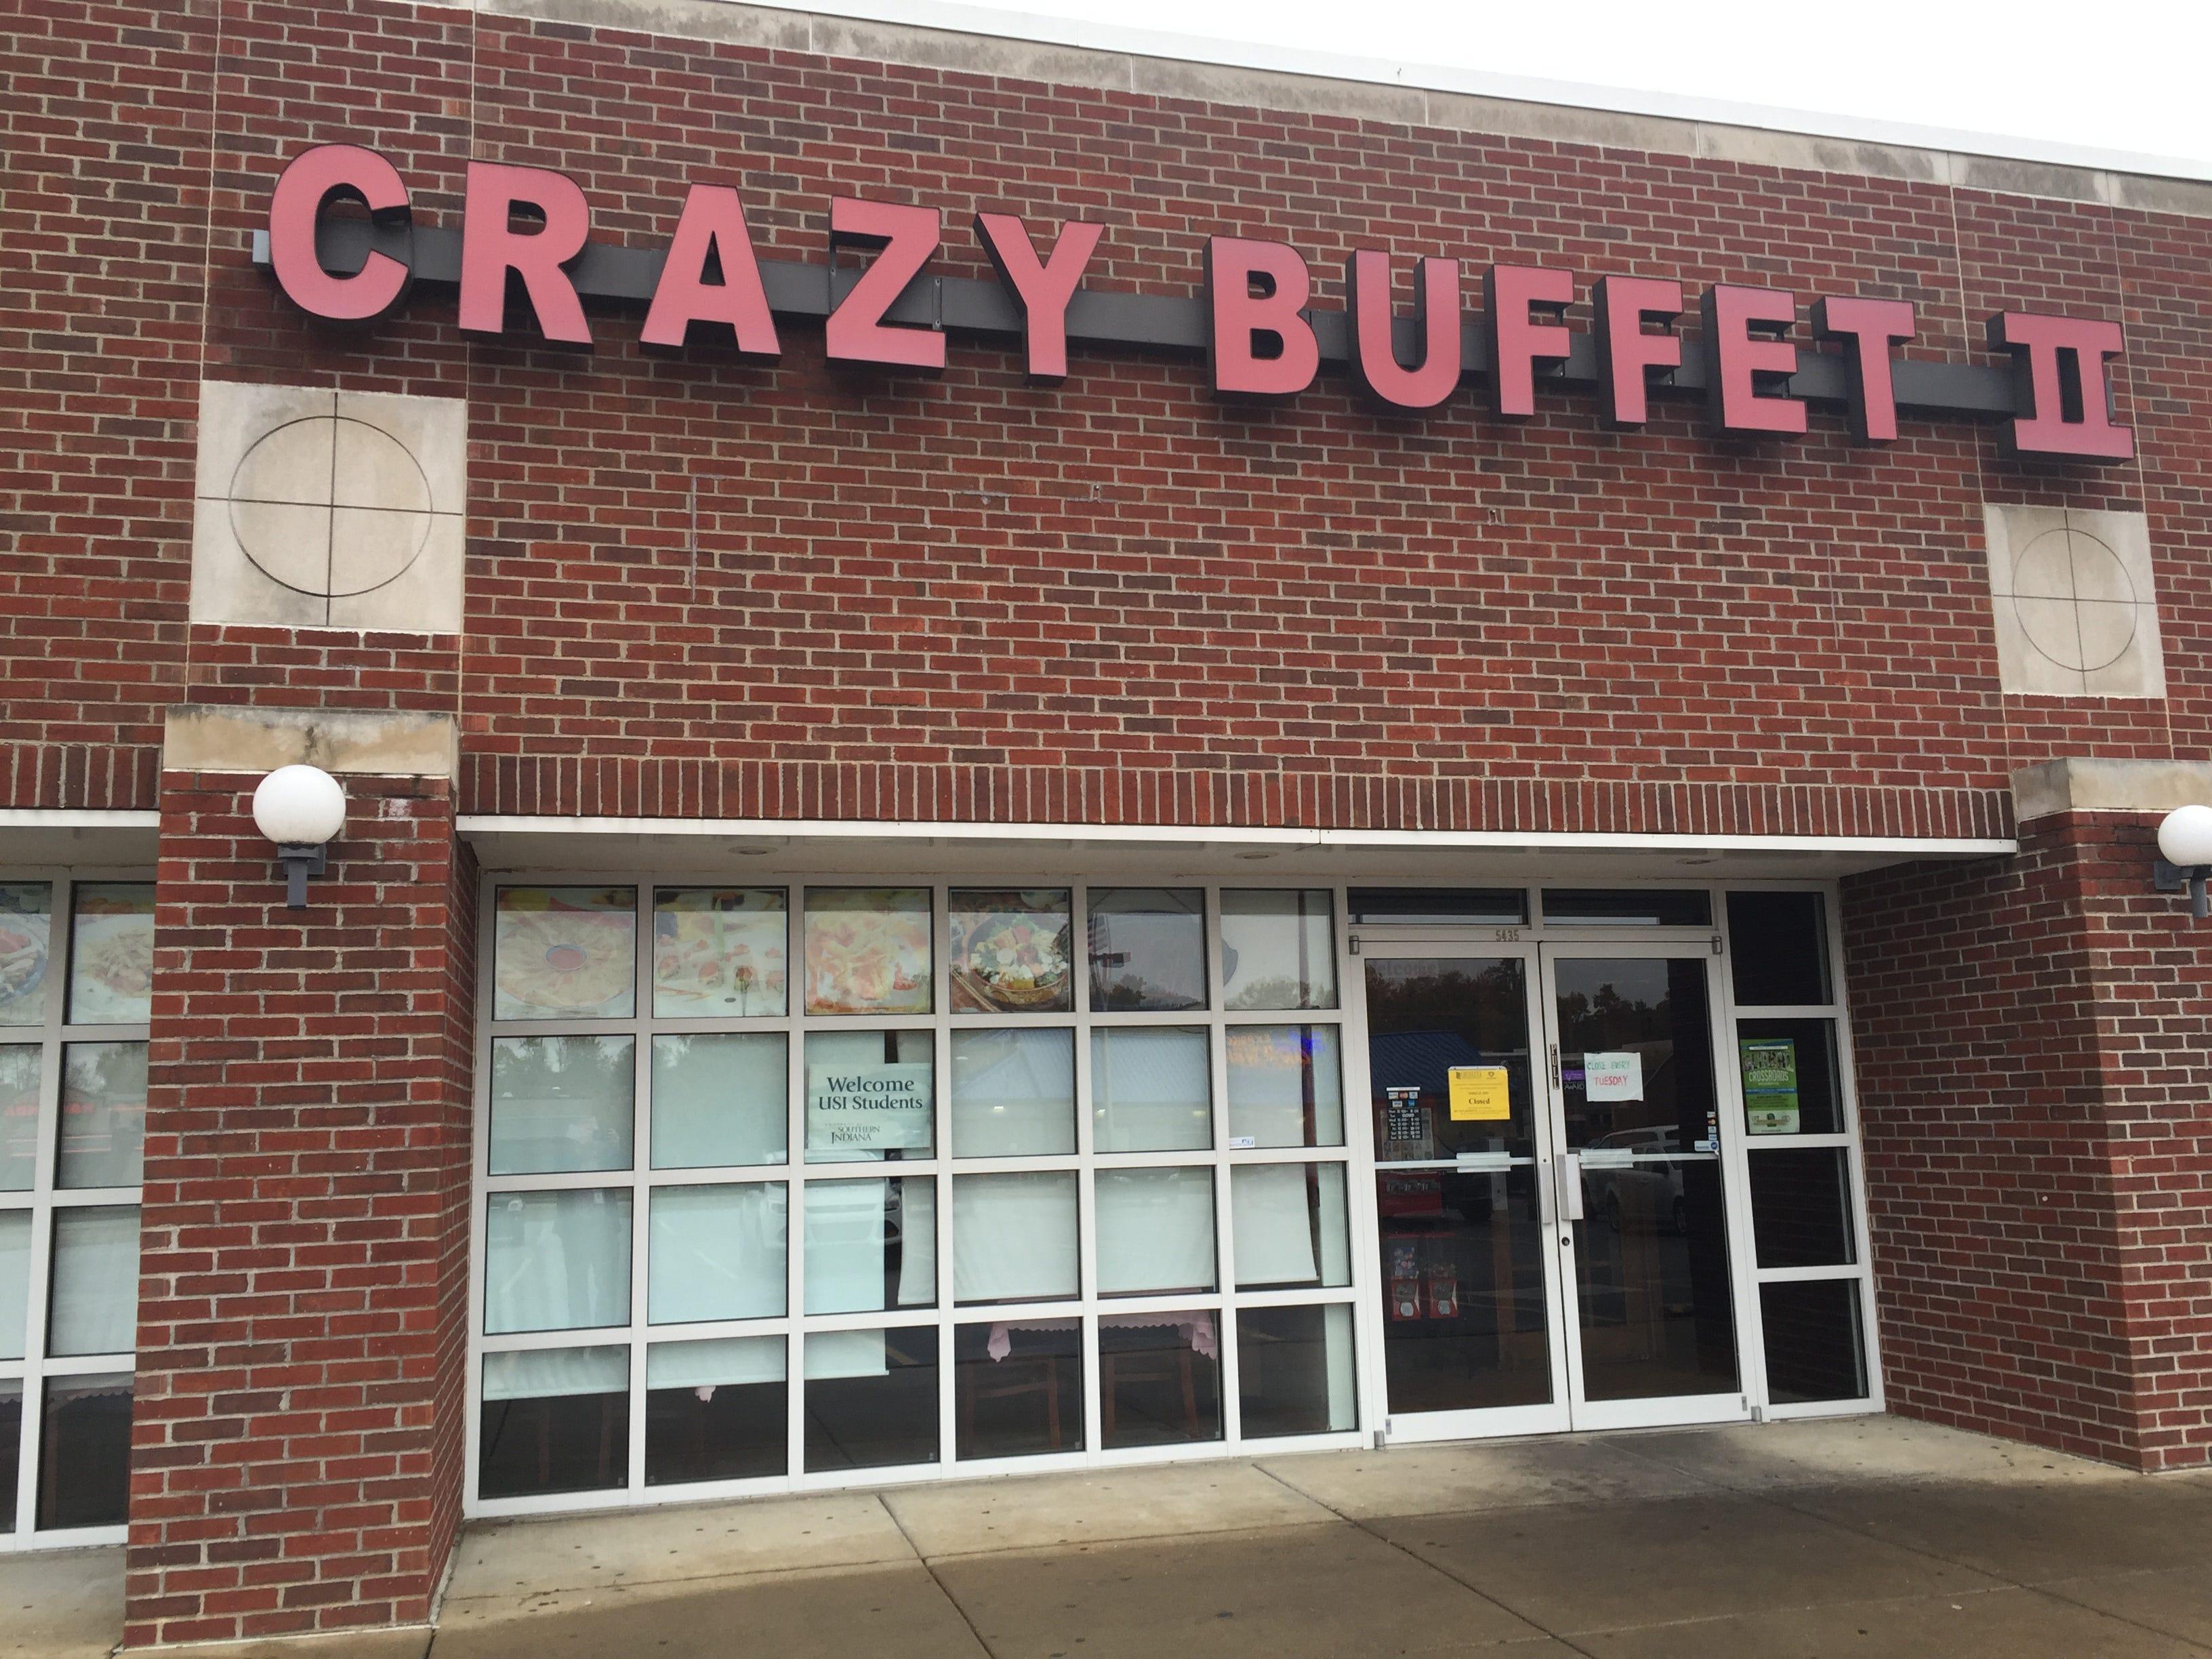 crazy buffet ii on evansville s west side reopens rh courierpress com crazy buffet 2 evansville indiana crazy buffet evansville indiana closed by health department